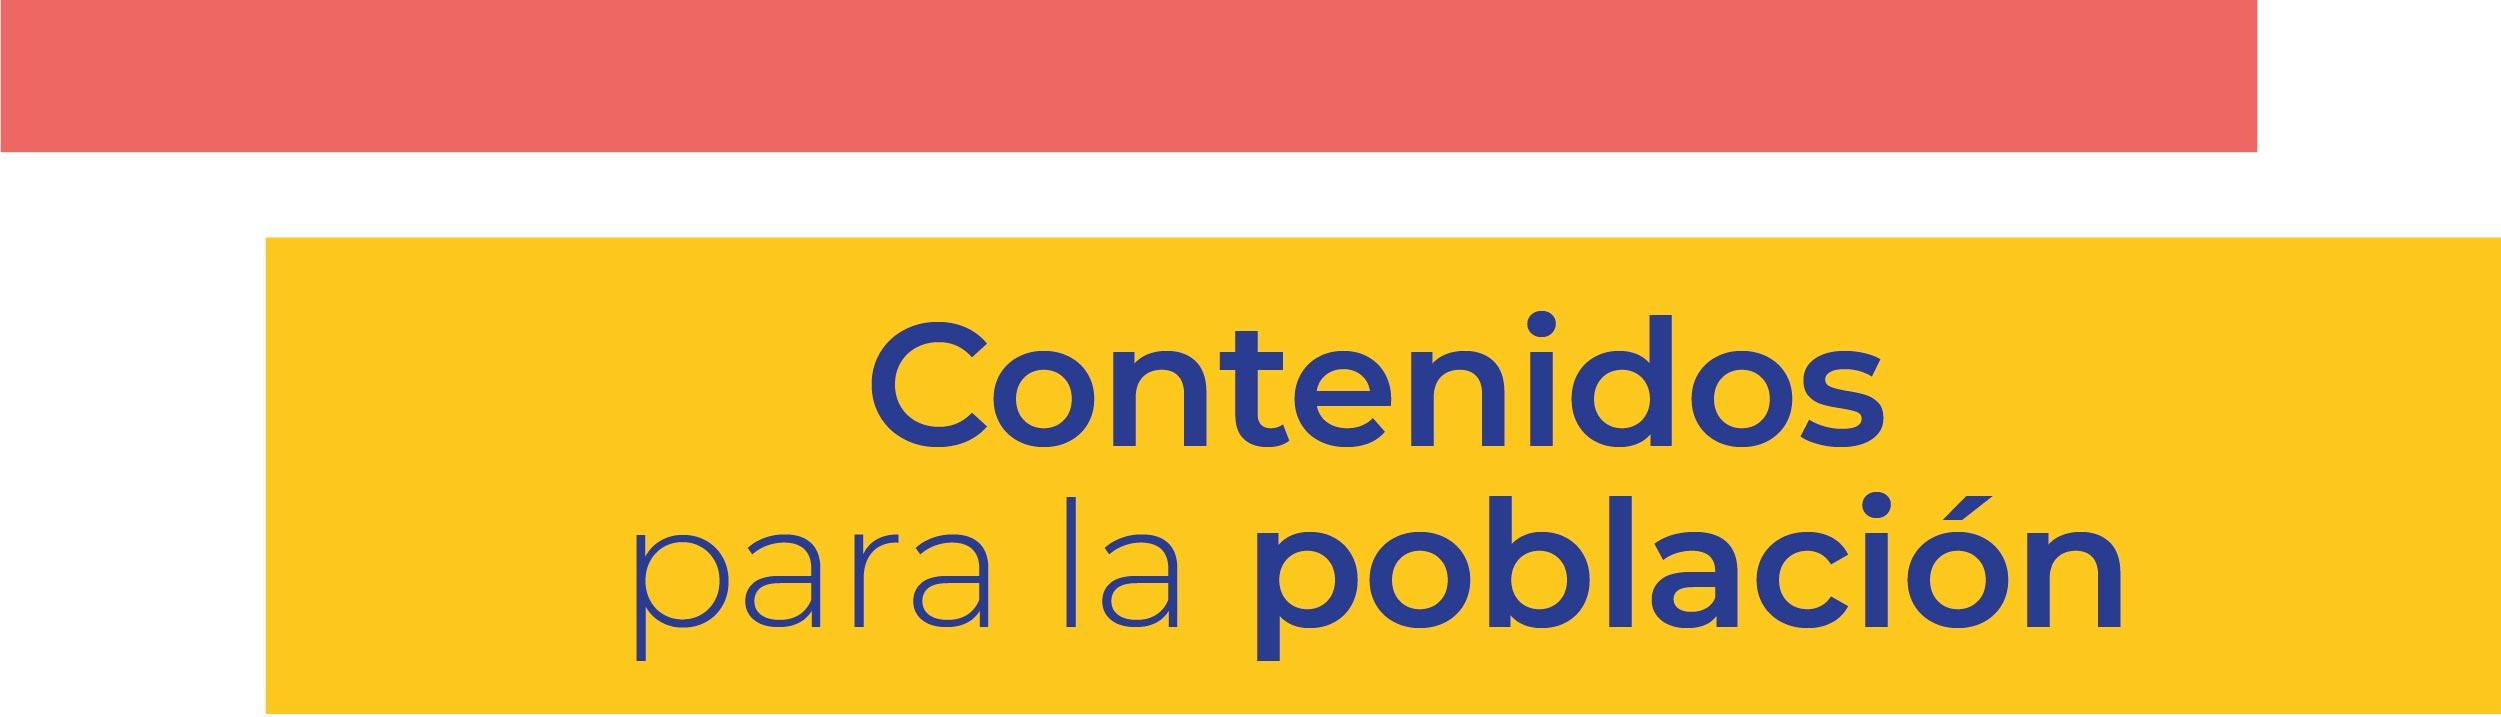 /cms/uploads/image/file/563709/Botones_contenido_poblaci_n_070220.jpg